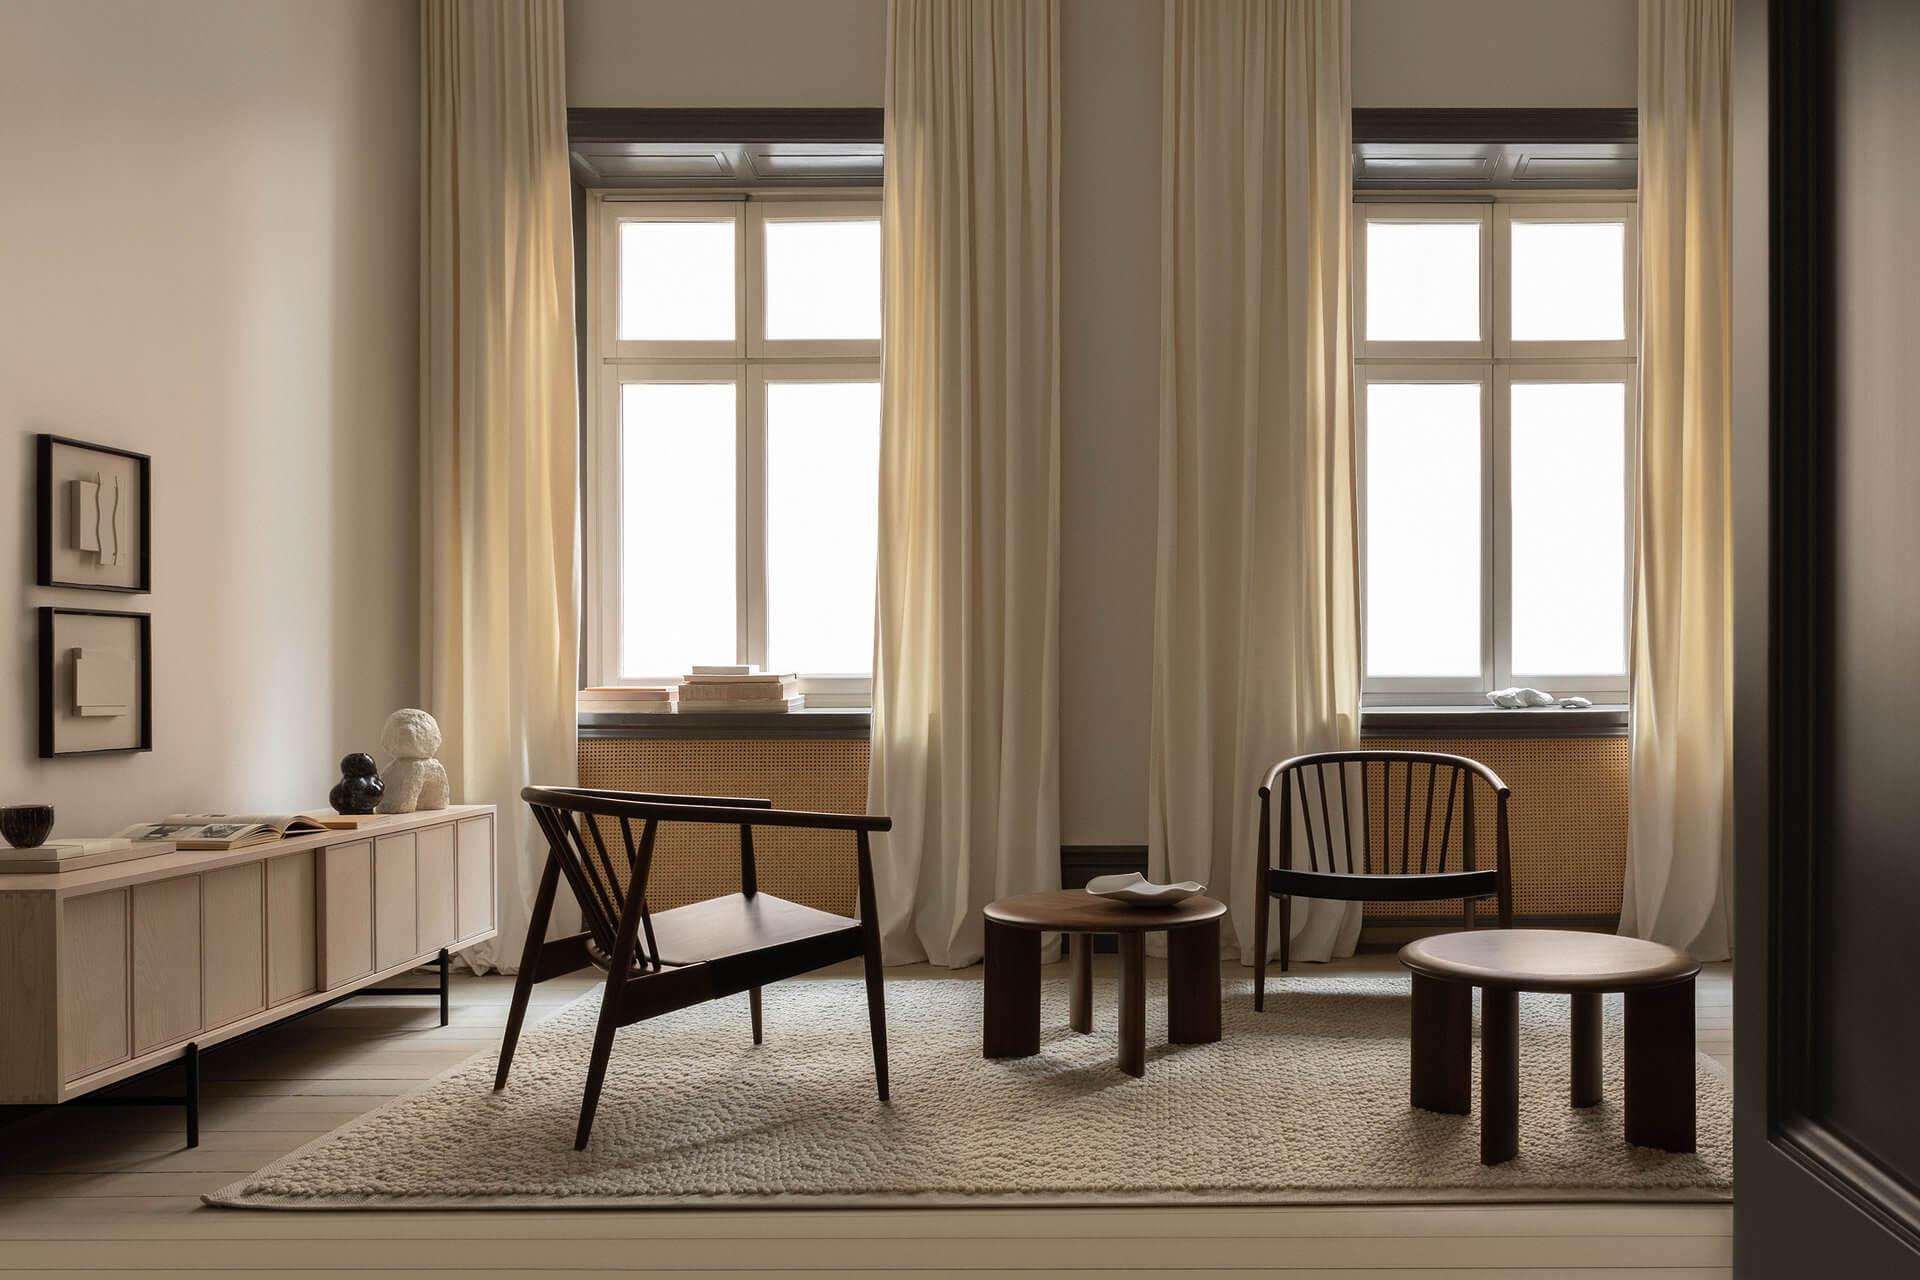 Ercol-Designer-English-Furniture